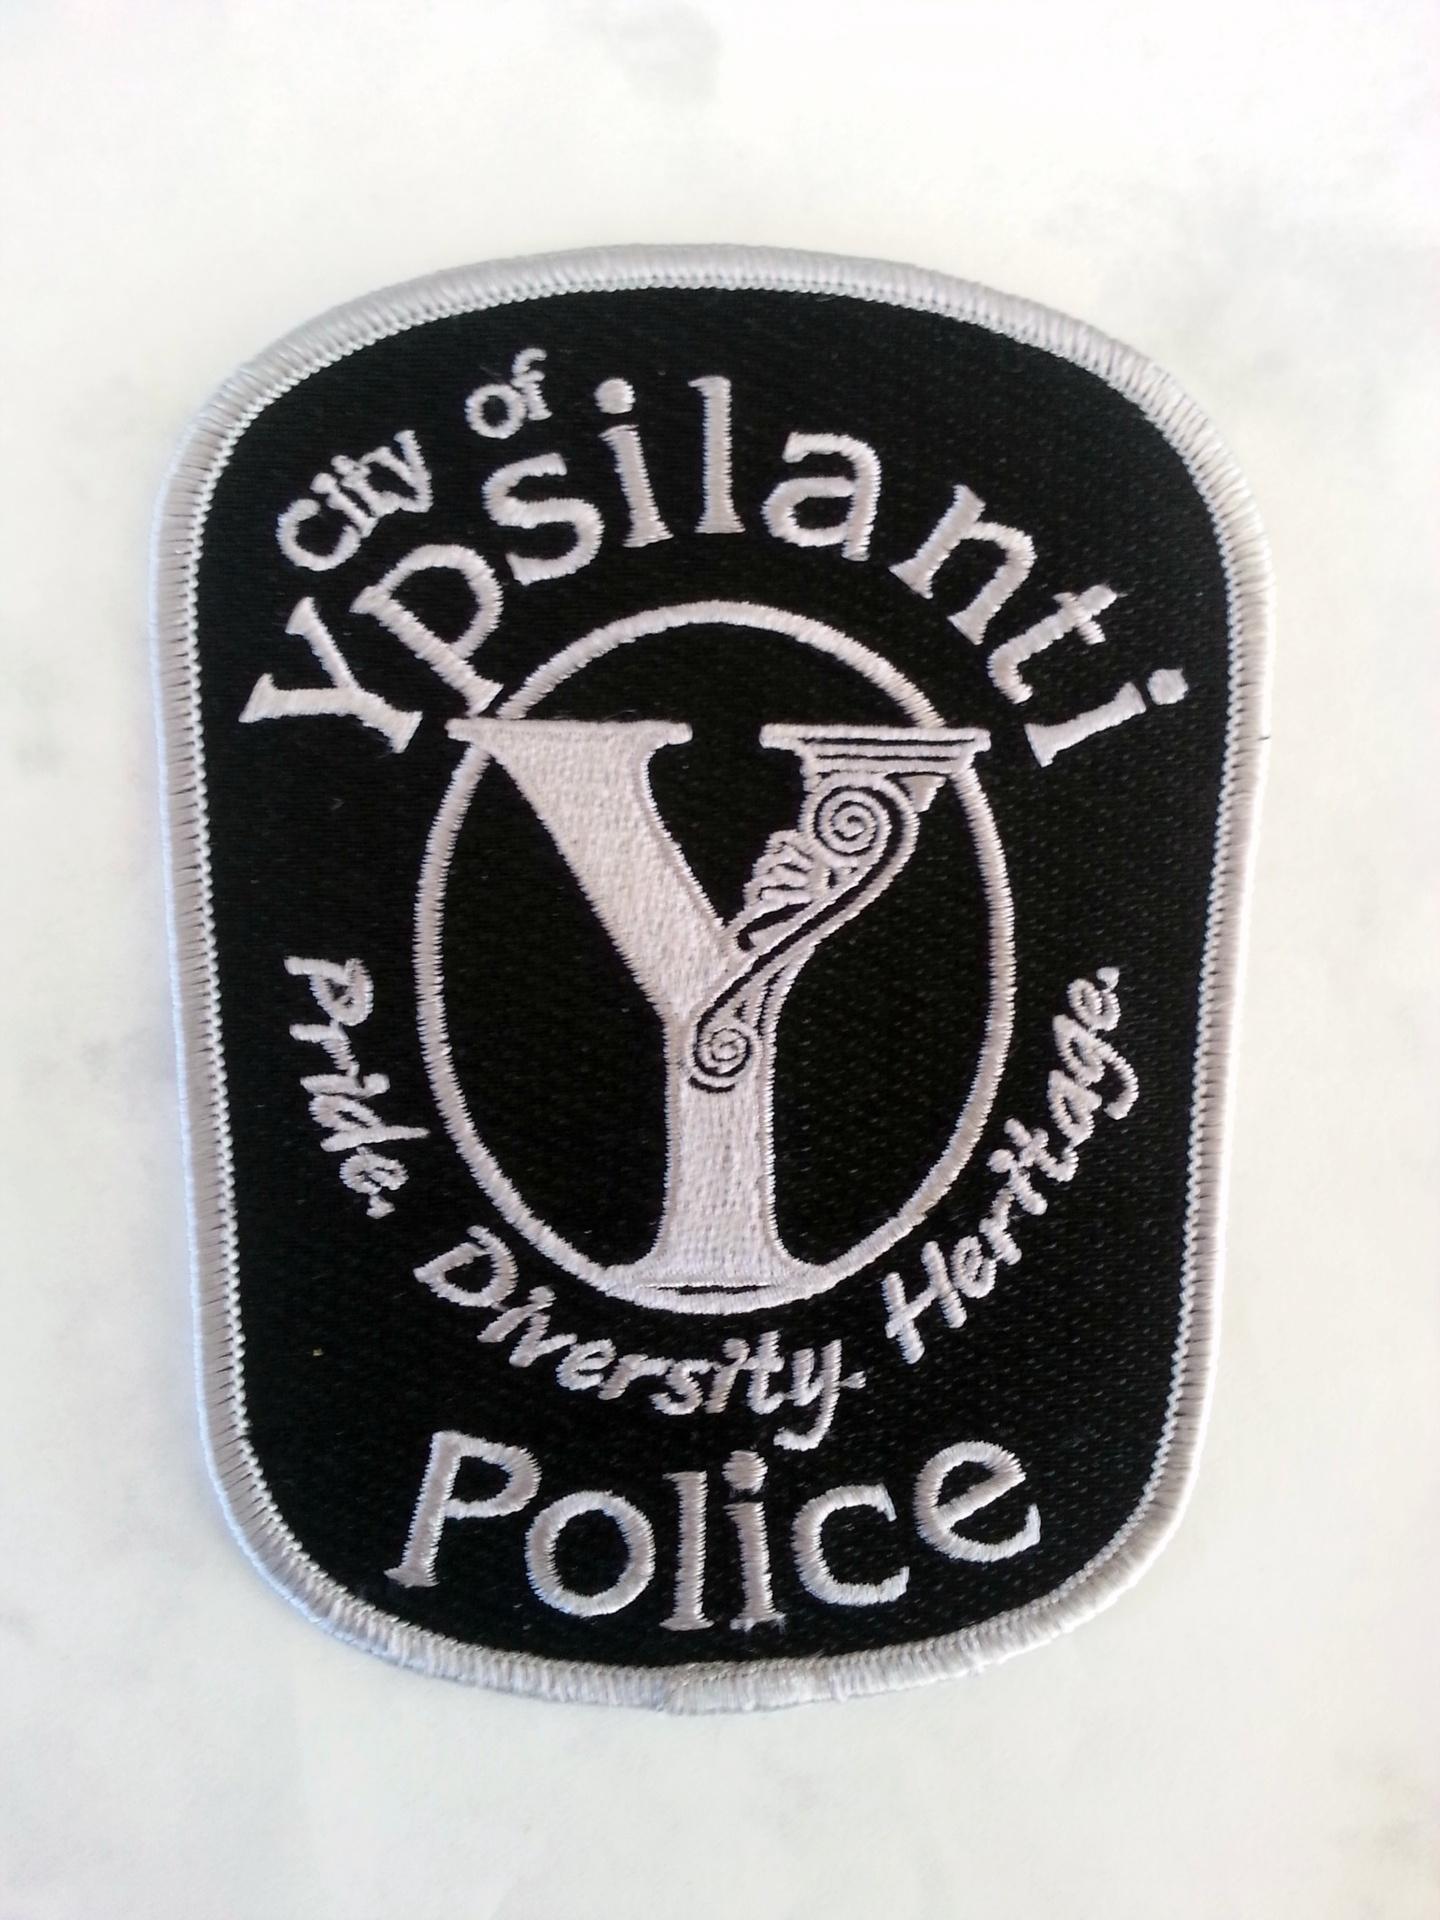 Ypsilanti, Mich. Police